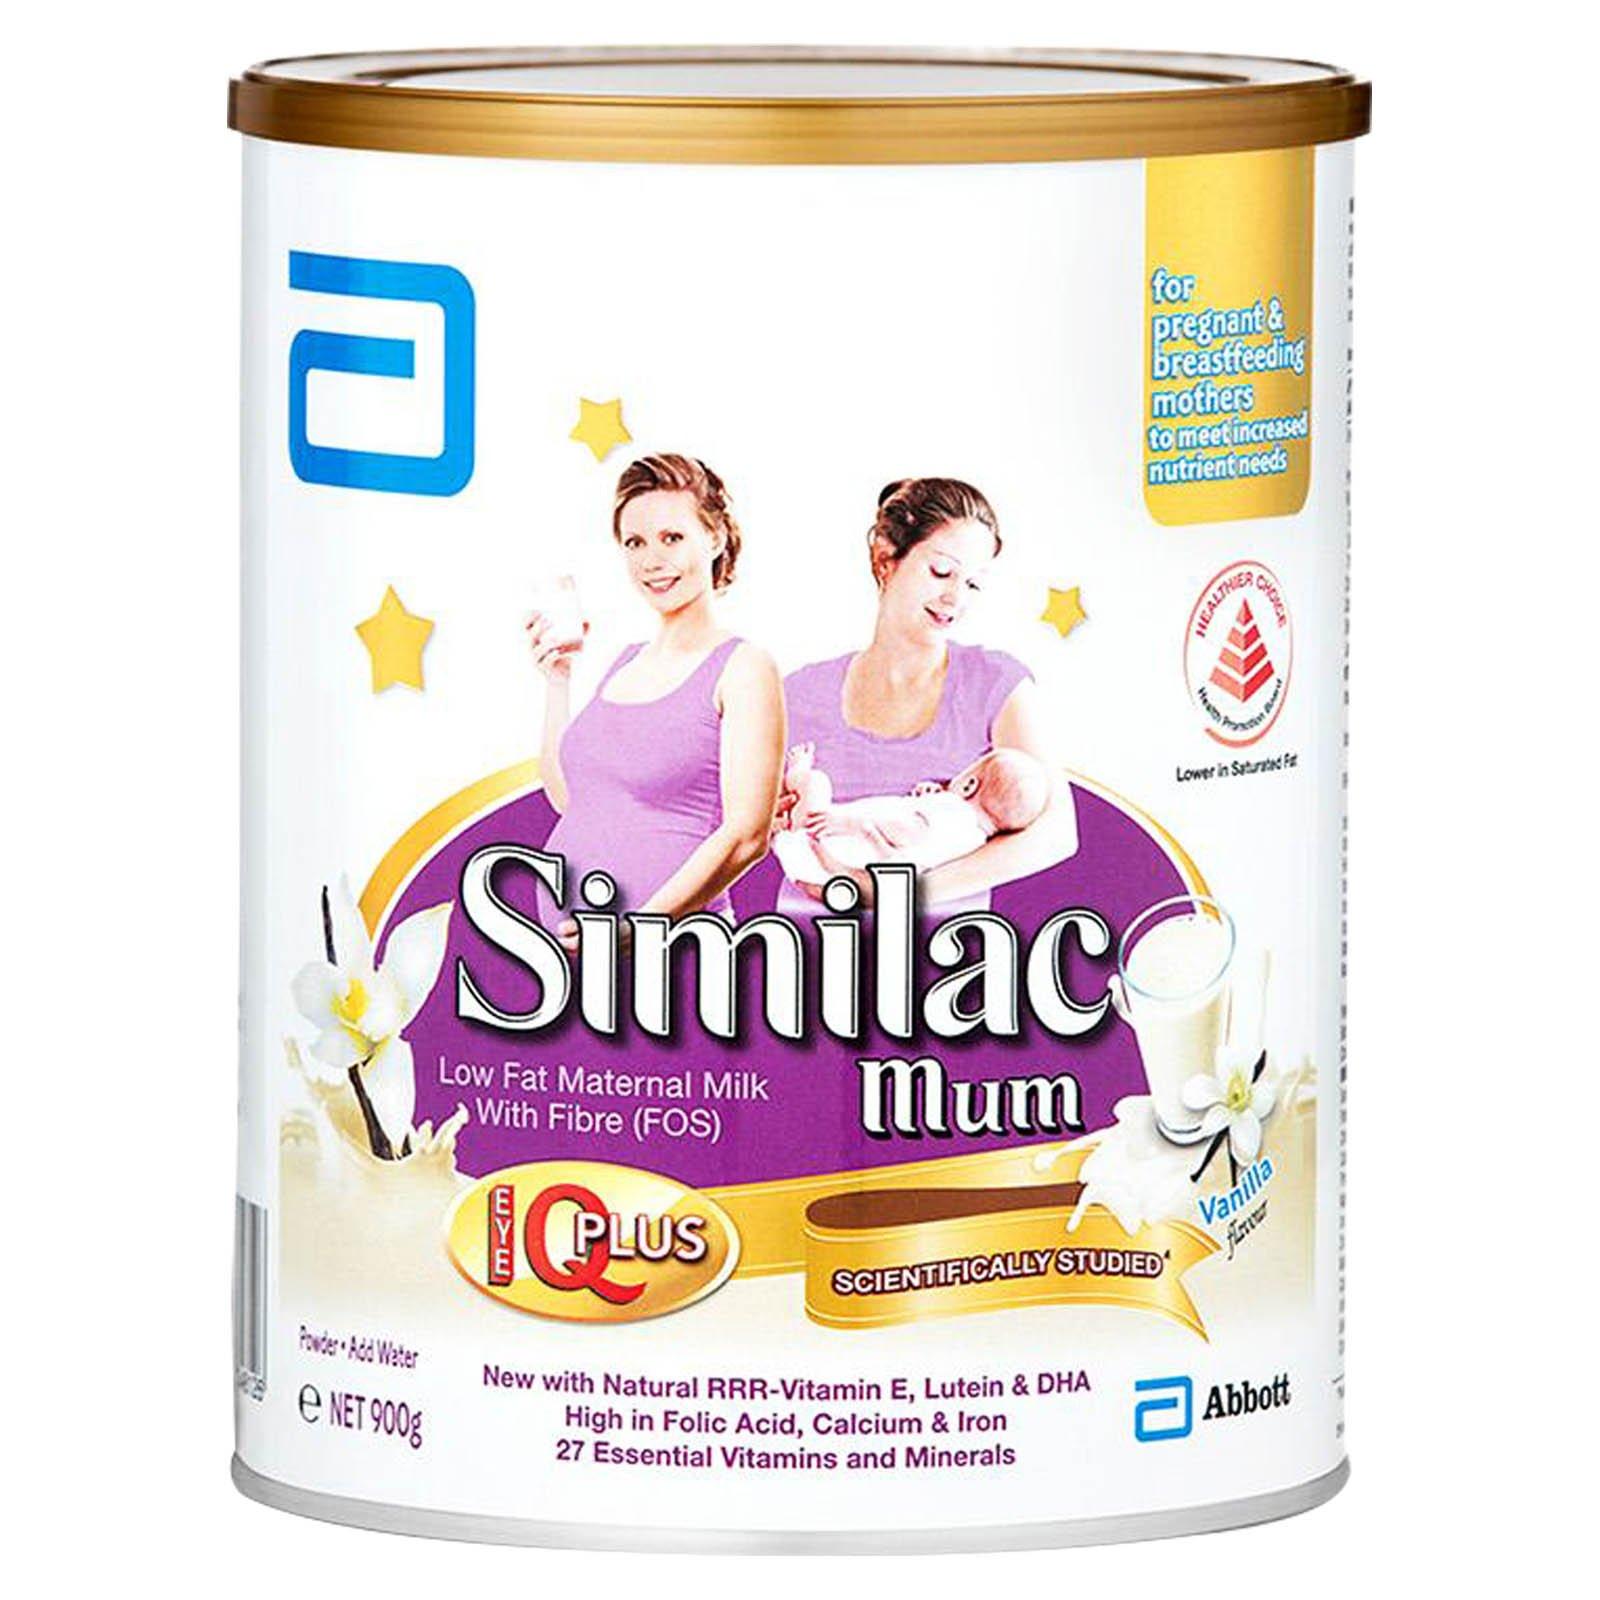 Similac Mum Eye-Q (IQ) 900gm